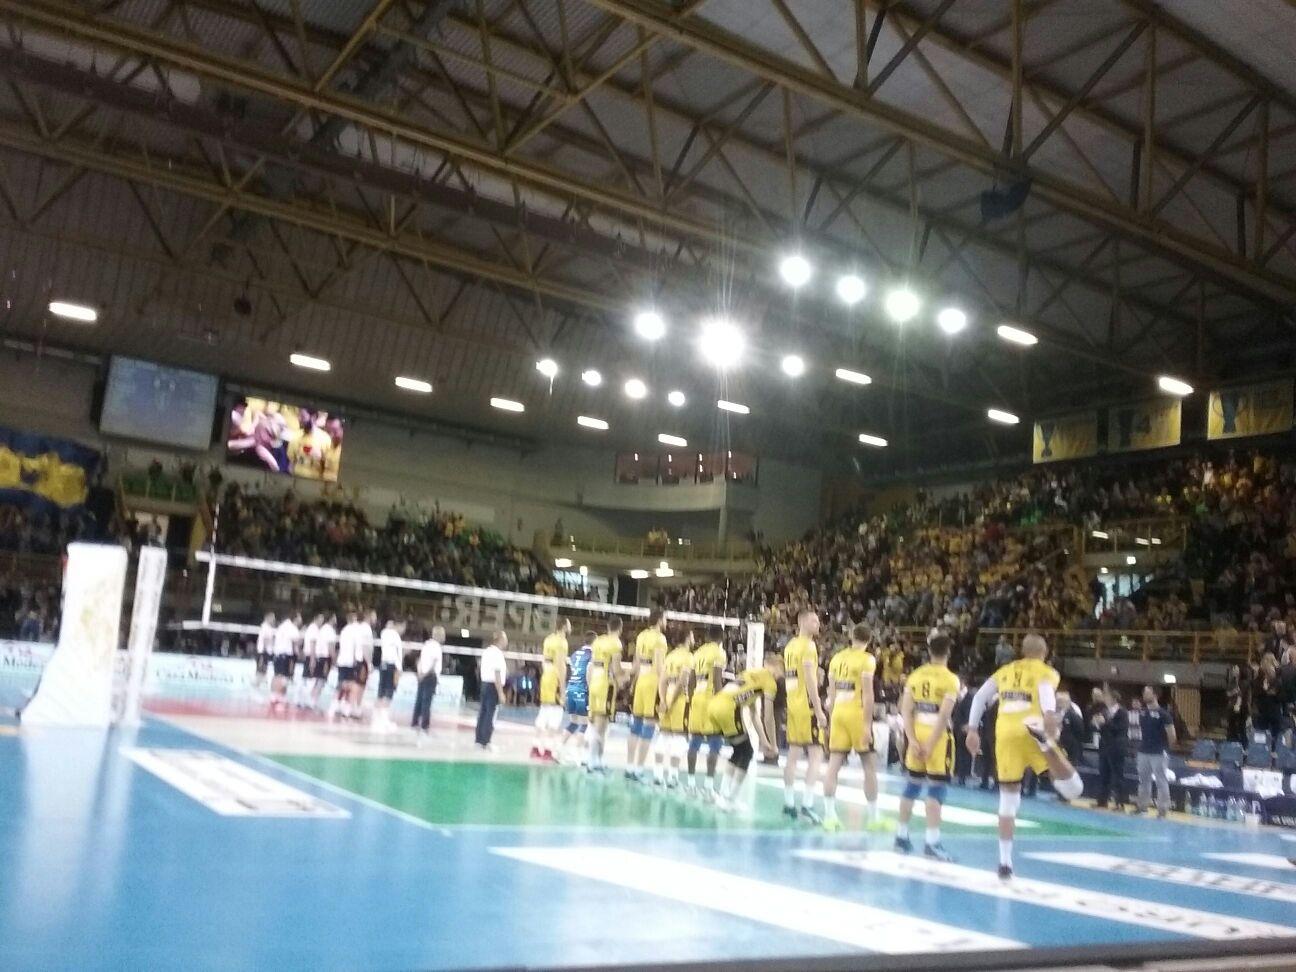 Modena in semifinale, la serie ci sorride in rimonta: 2-1. Verona eliminata.